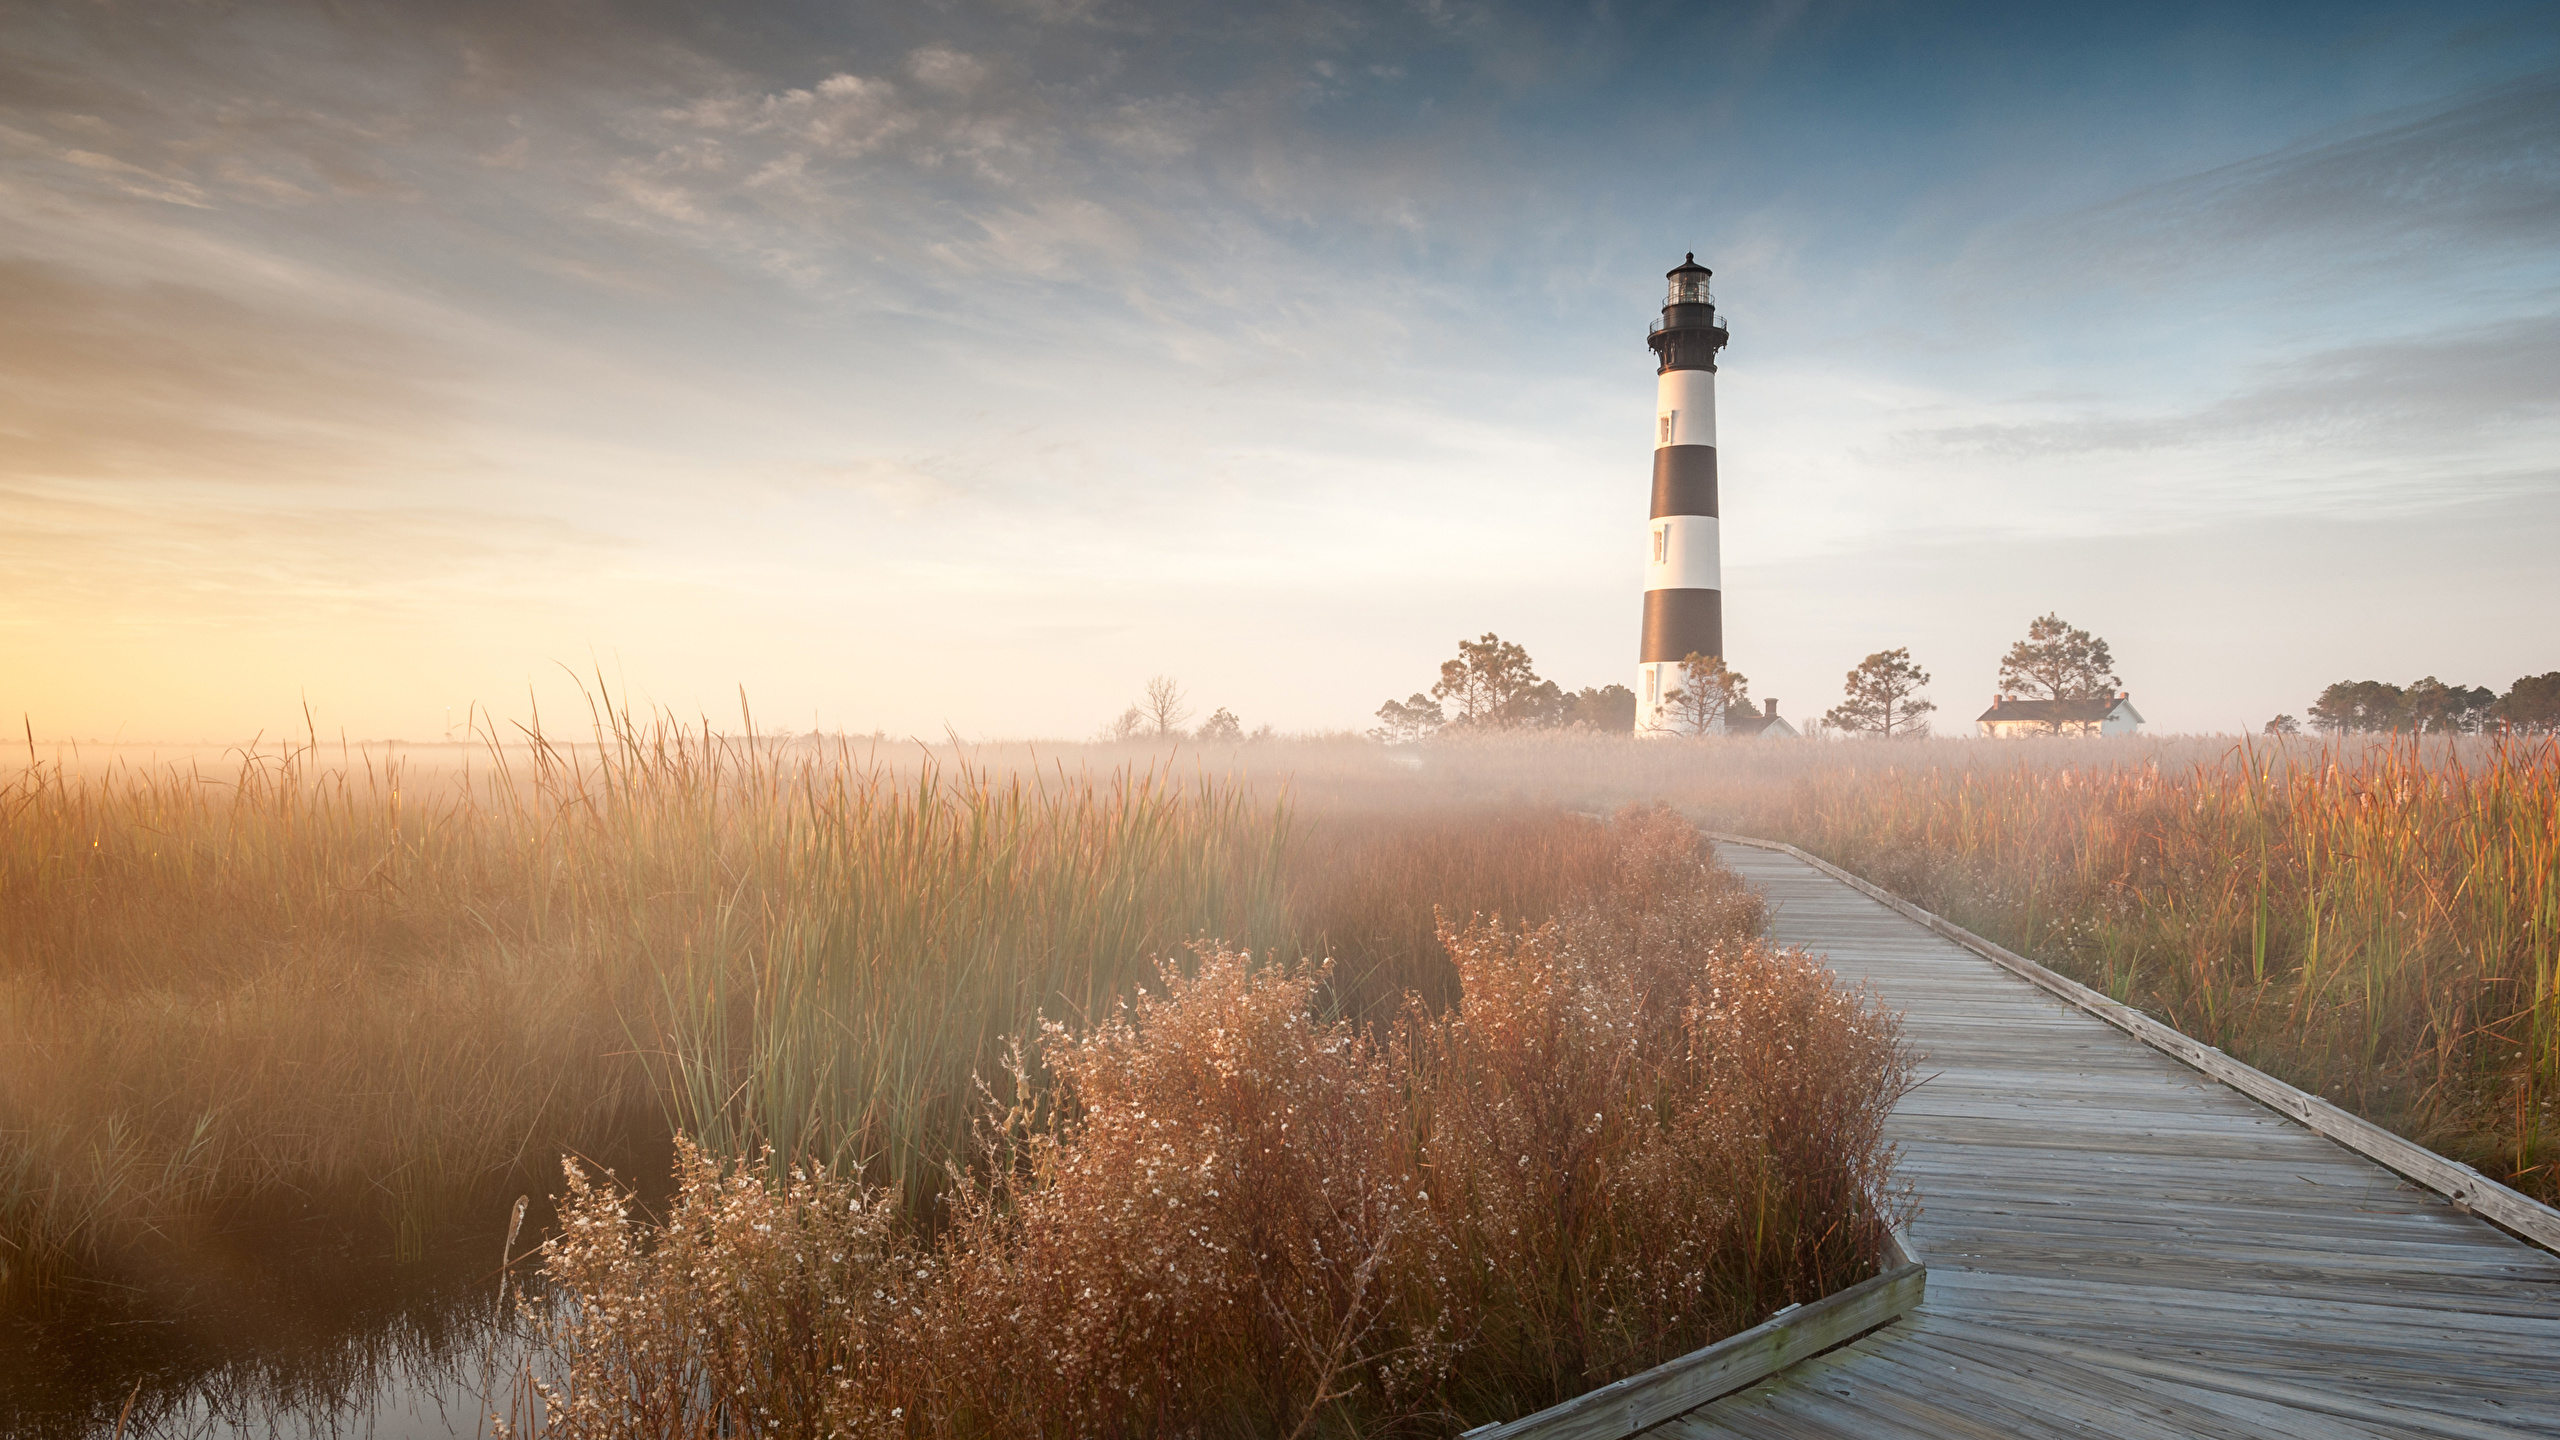 Image USA Bodie Island North Carolina Nature Lighthouses 2560x1440 2560x1440